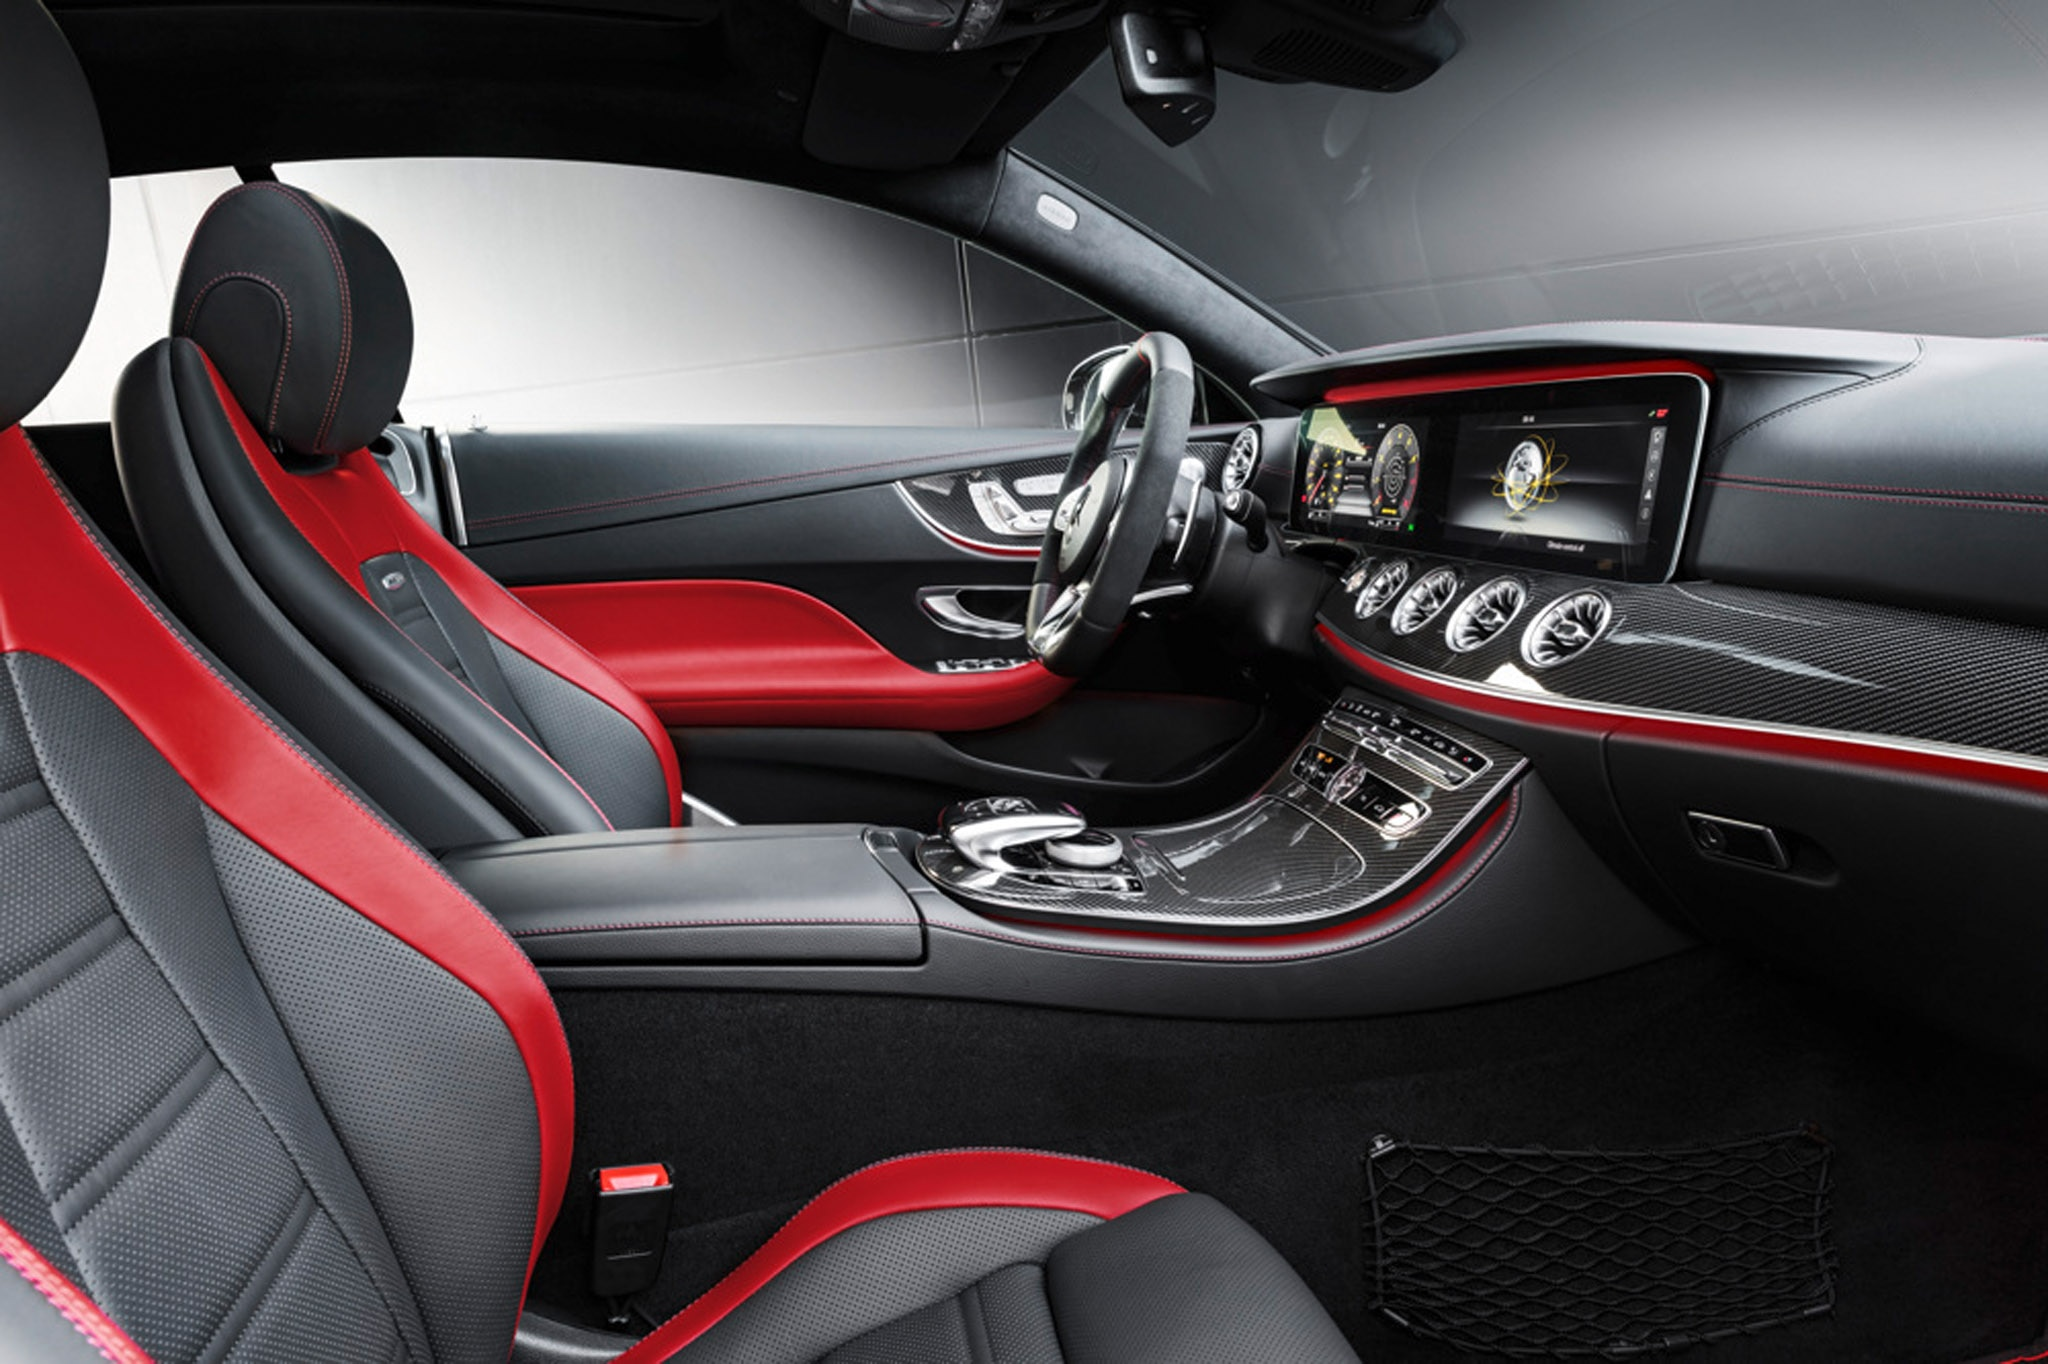 https://st.automobilemag.com/uploads/sites/11/2018/01/2019-Mercedes-AMG-E-53-Coupe_01.jpg